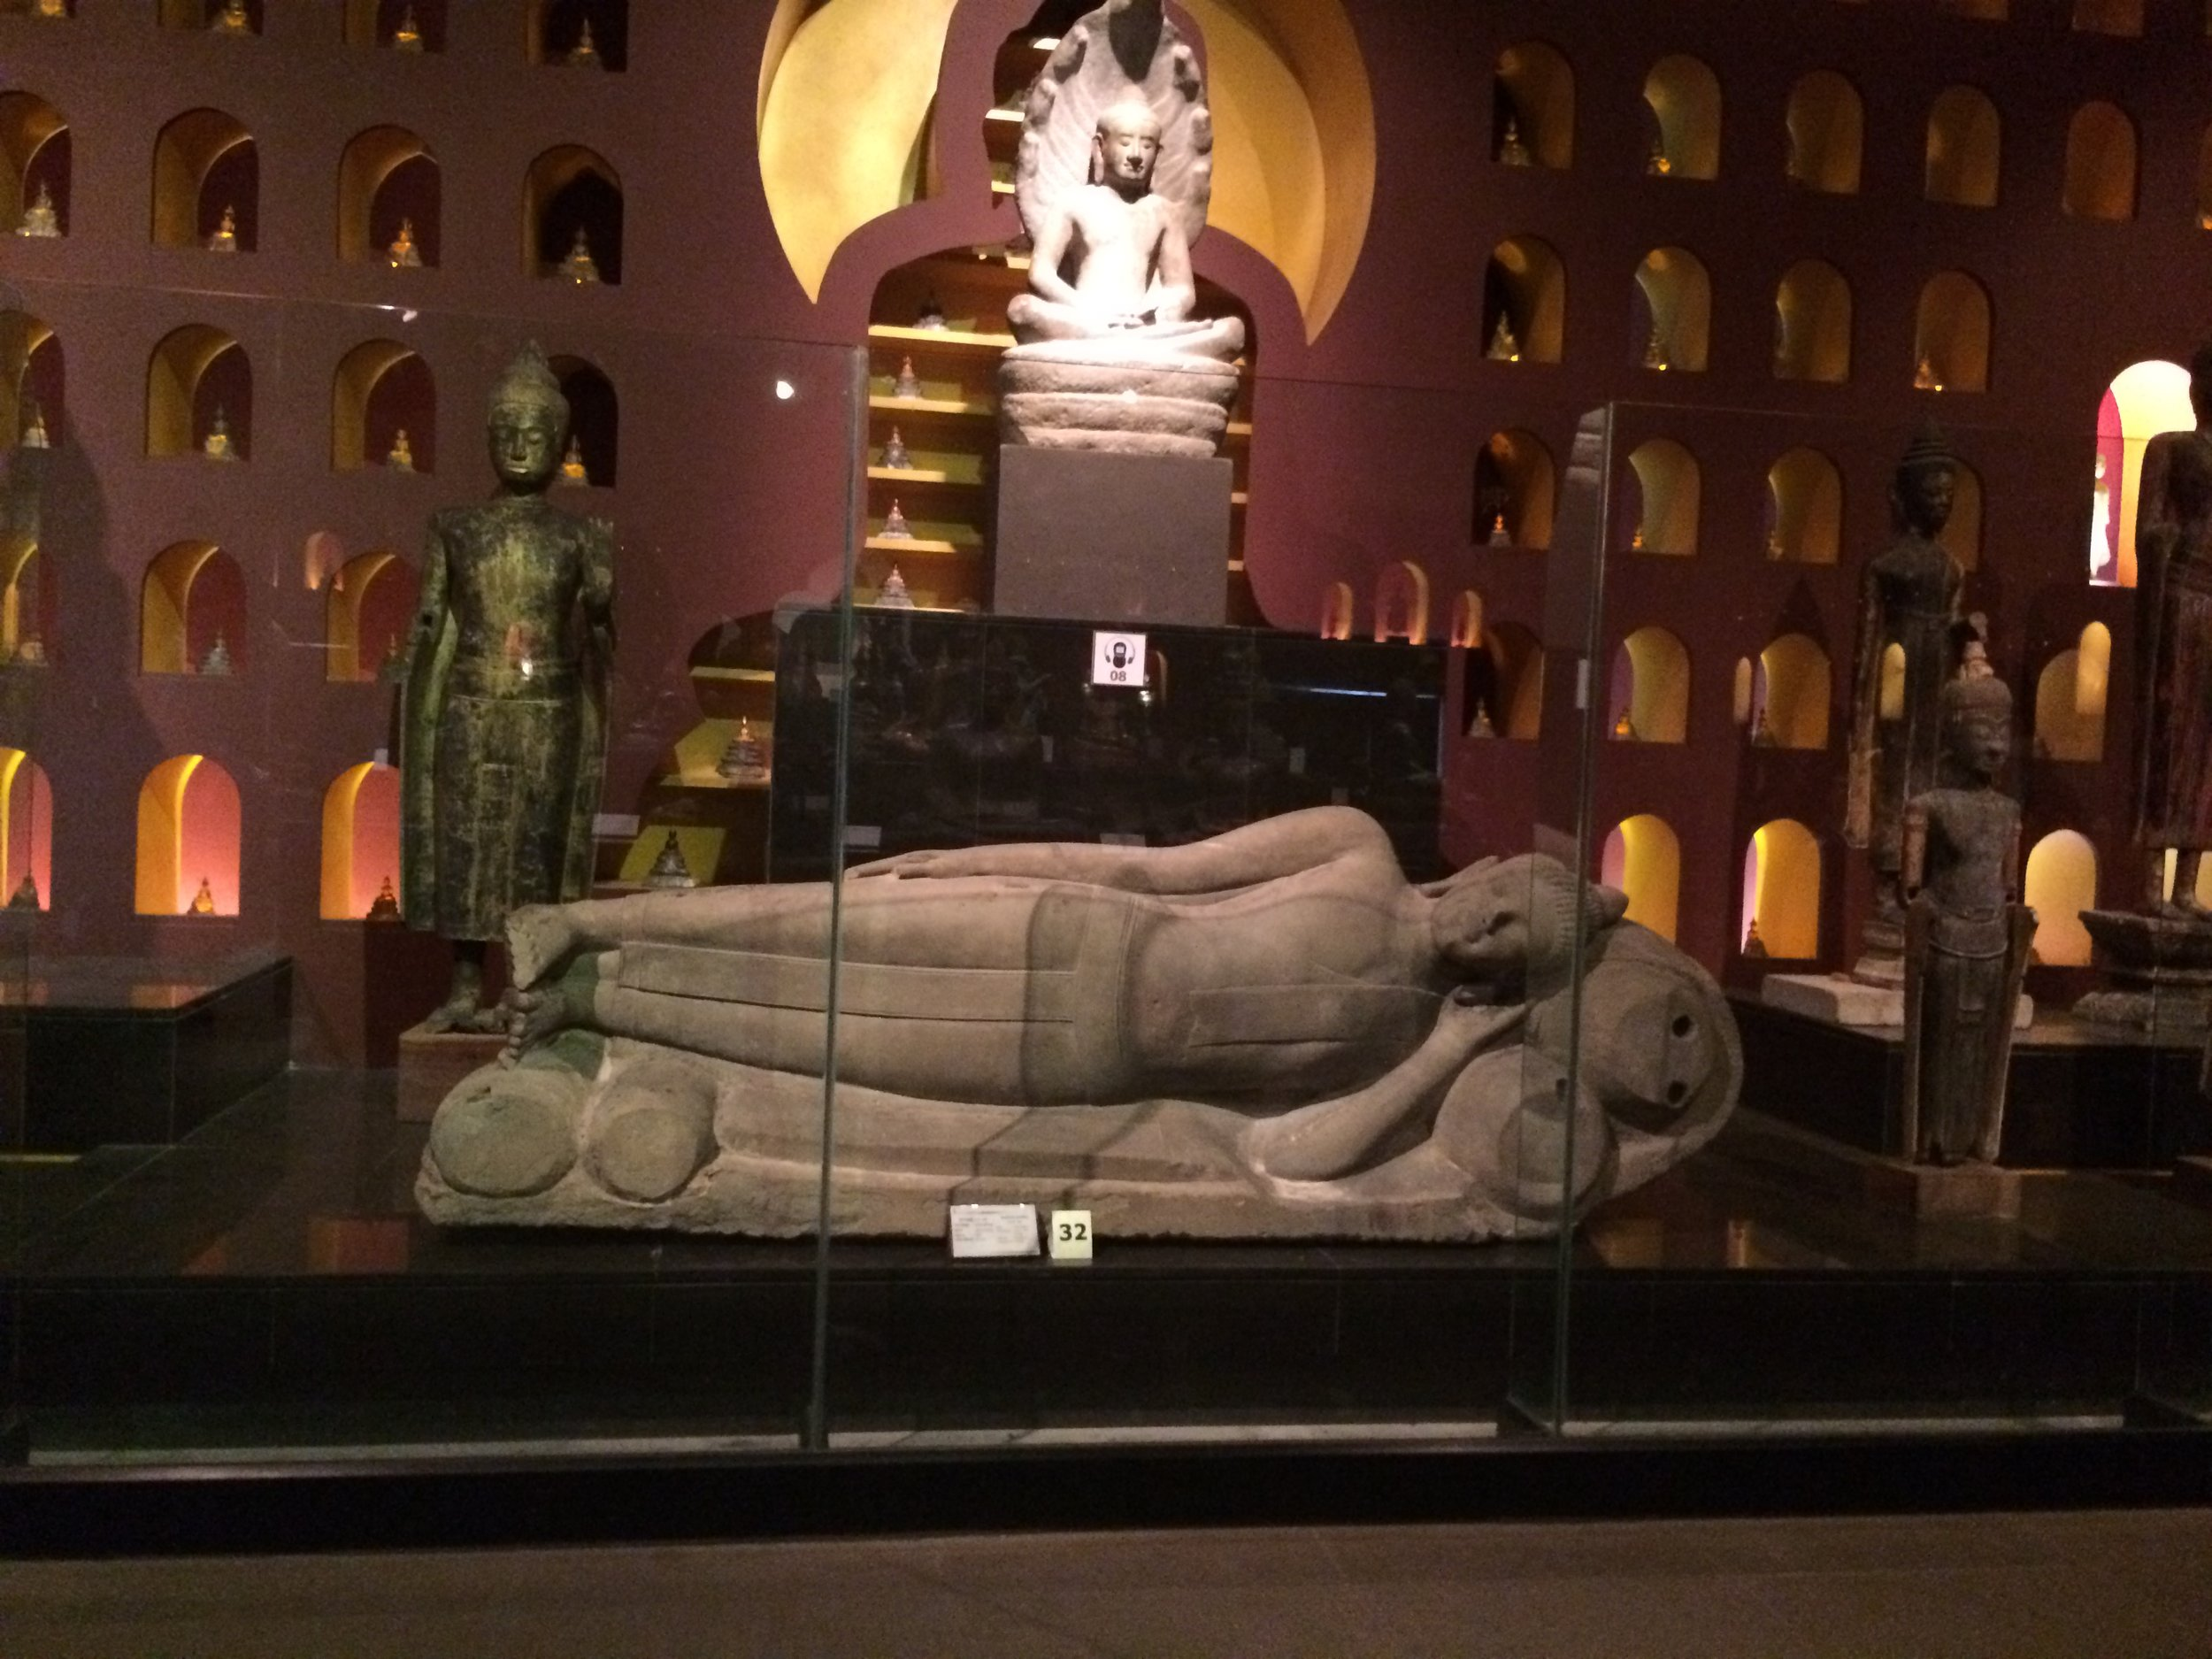 The room of 10,000 Buddha's